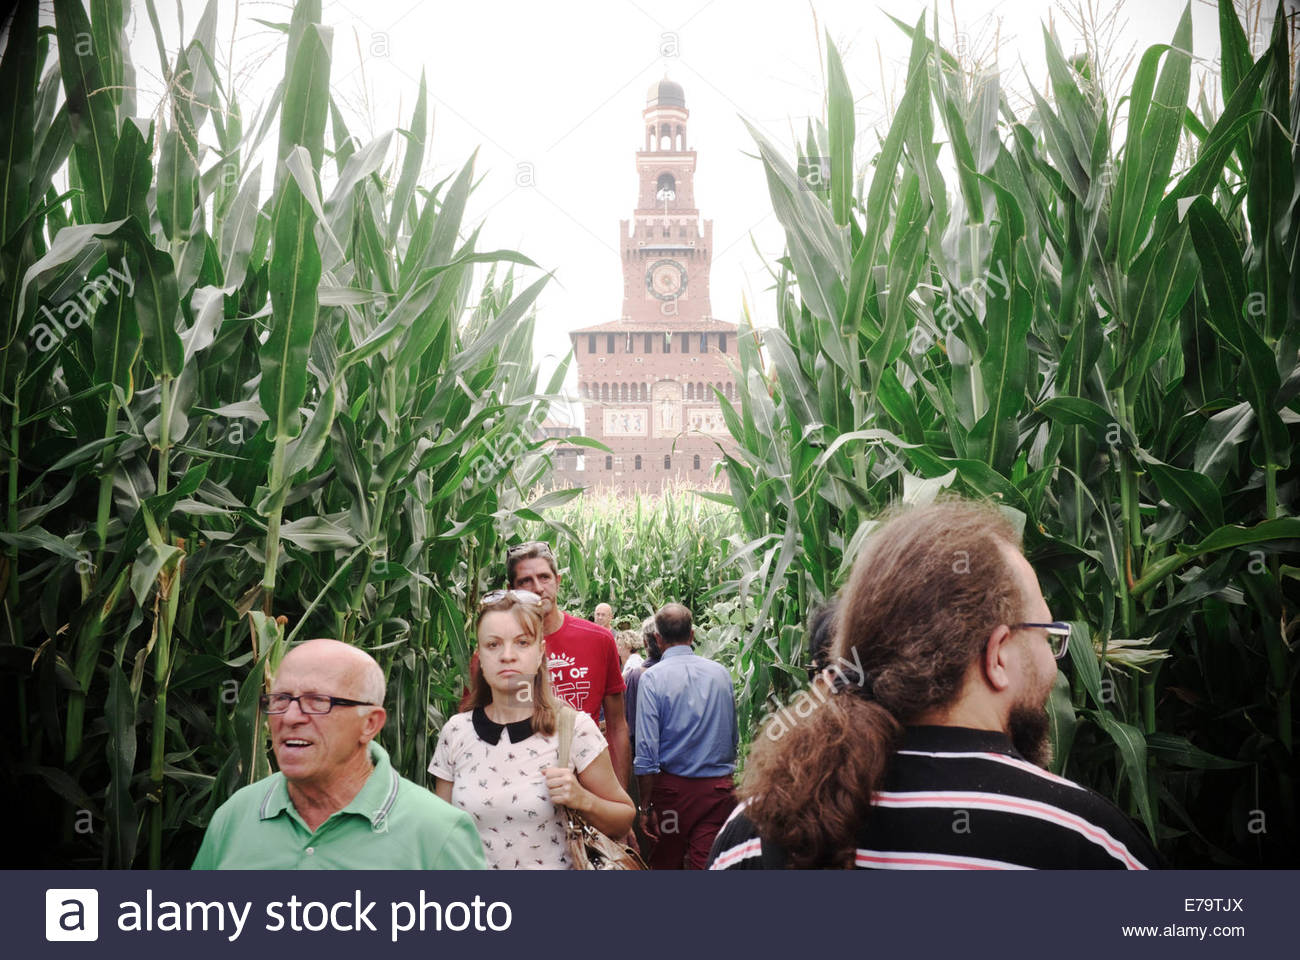 Sforza Castle provides a backdrop amongst a field of corn, an exhibit at Expo Gate, part of Expo Milano 2015. Milan,Stock Photo